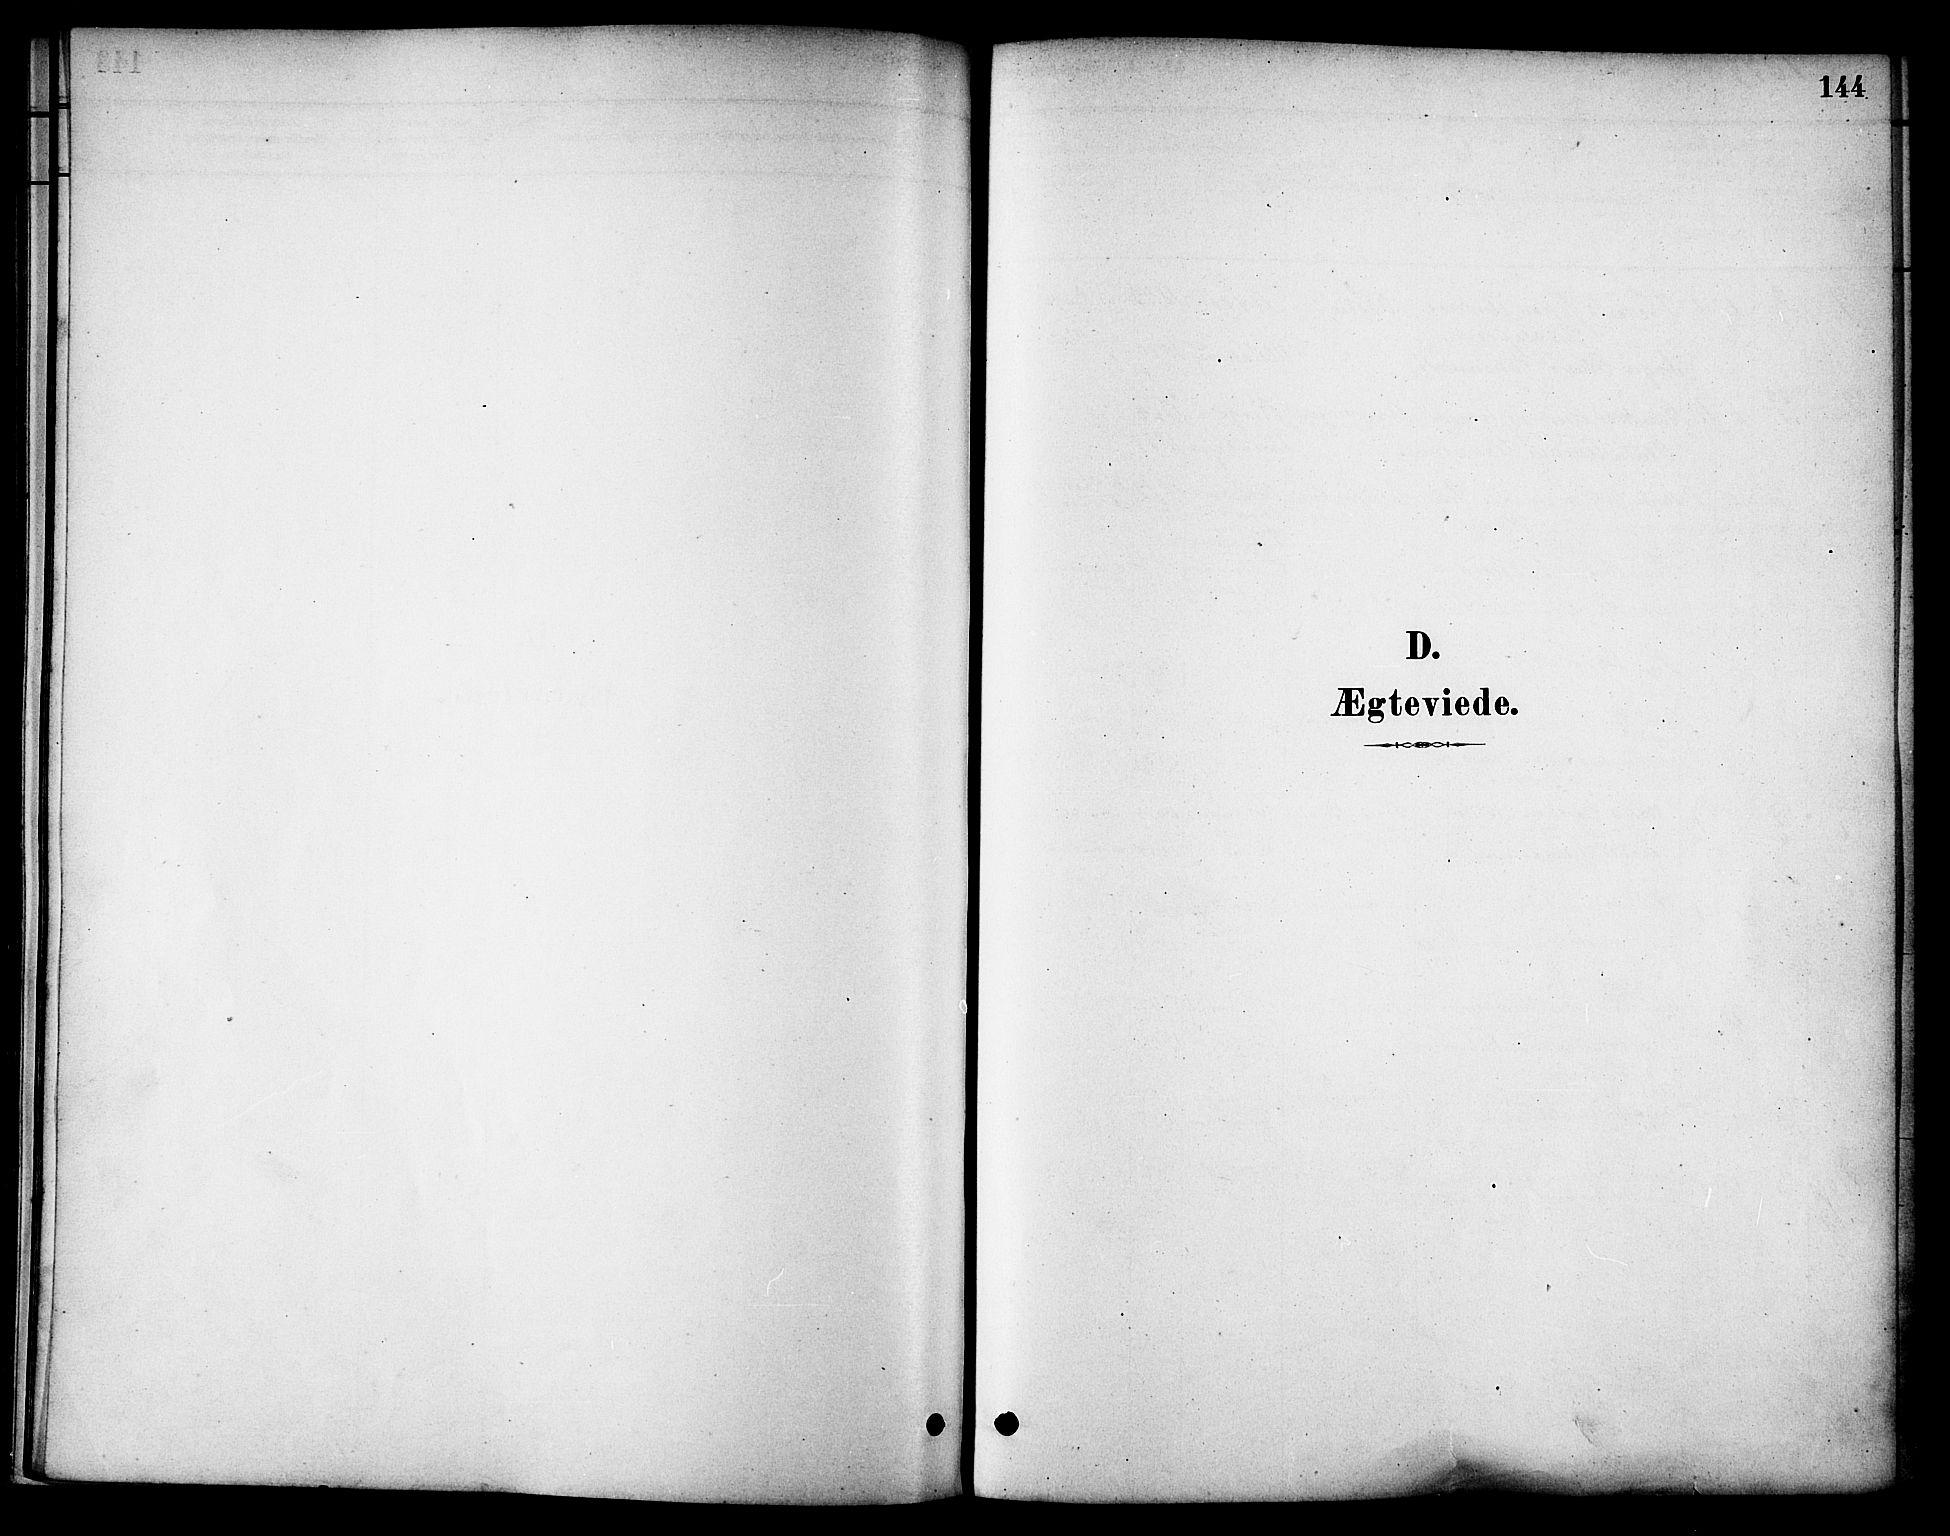 SAT, Ministerialprotokoller, klokkerbøker og fødselsregistre - Nordland, 801/L0030: Klokkerbok nr. 801C05, 1879-1887, s. 144